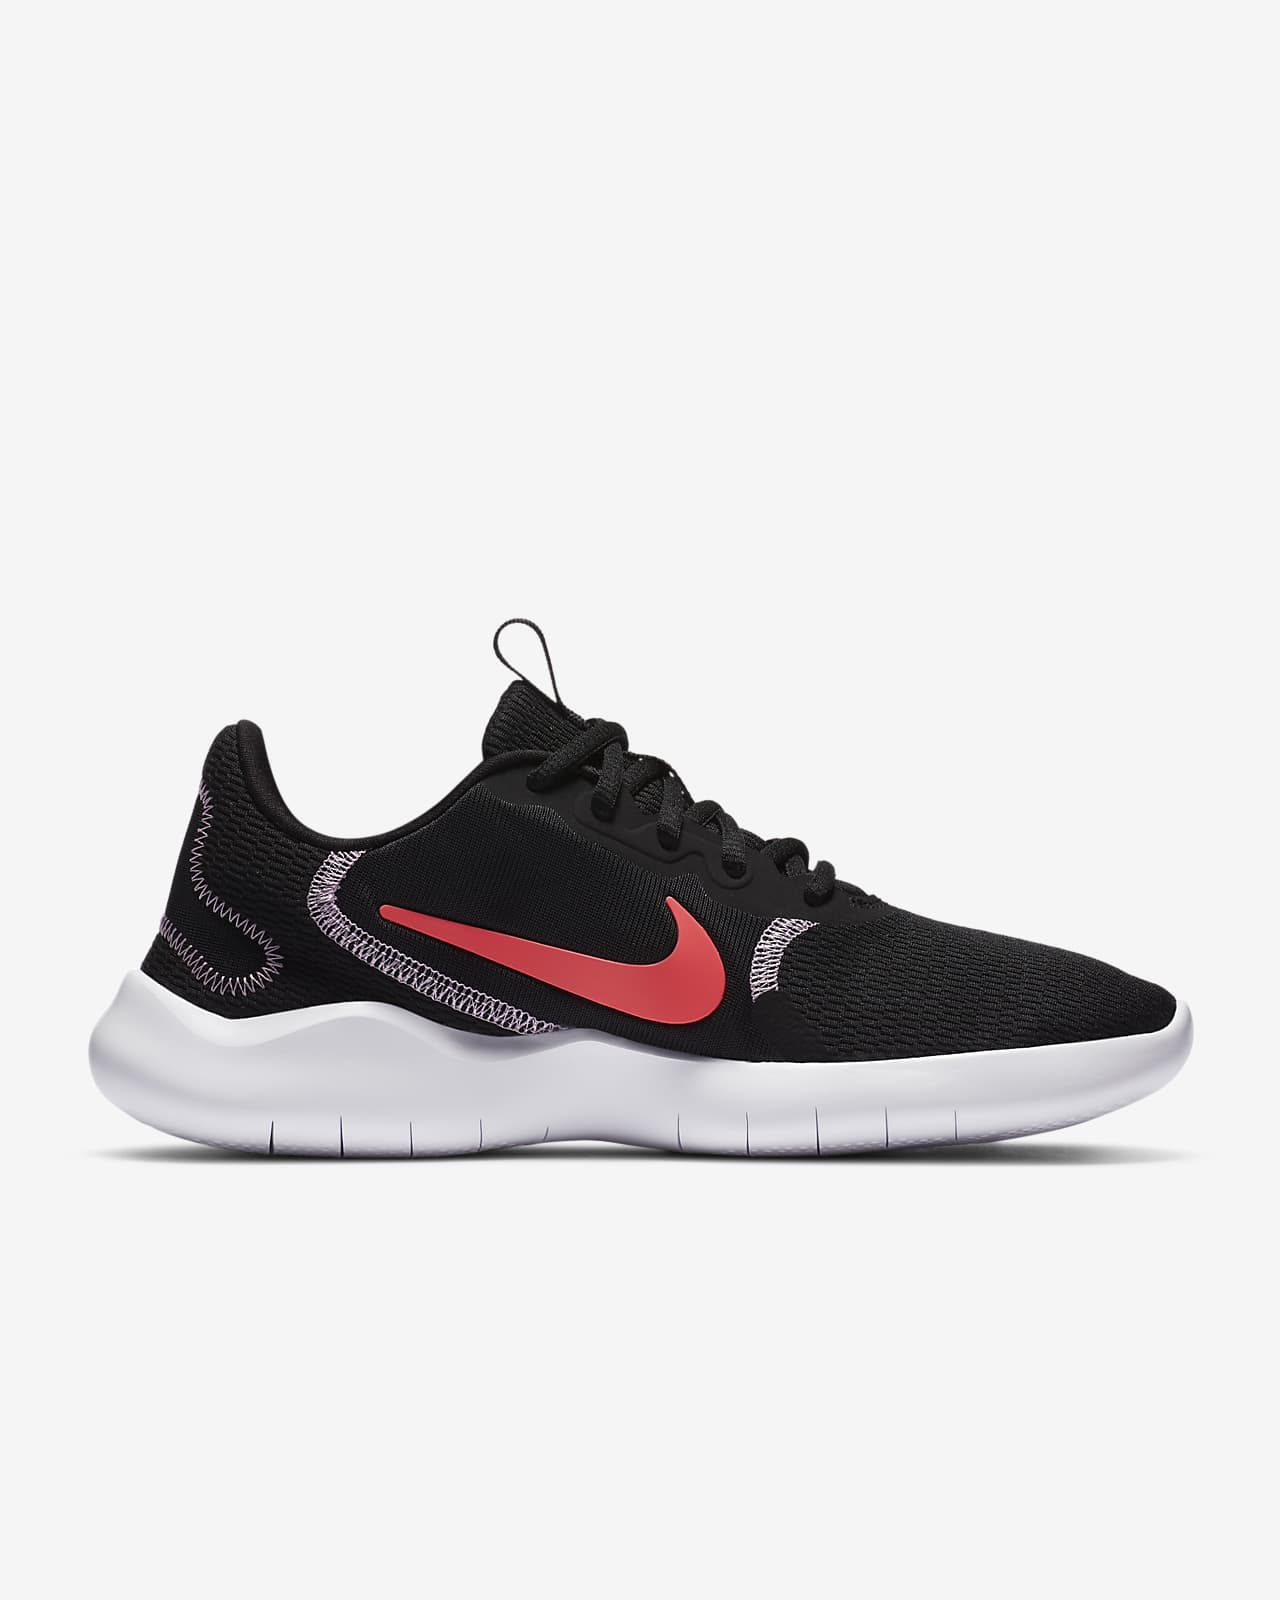 Nike Flex Experience Run 9 Women's